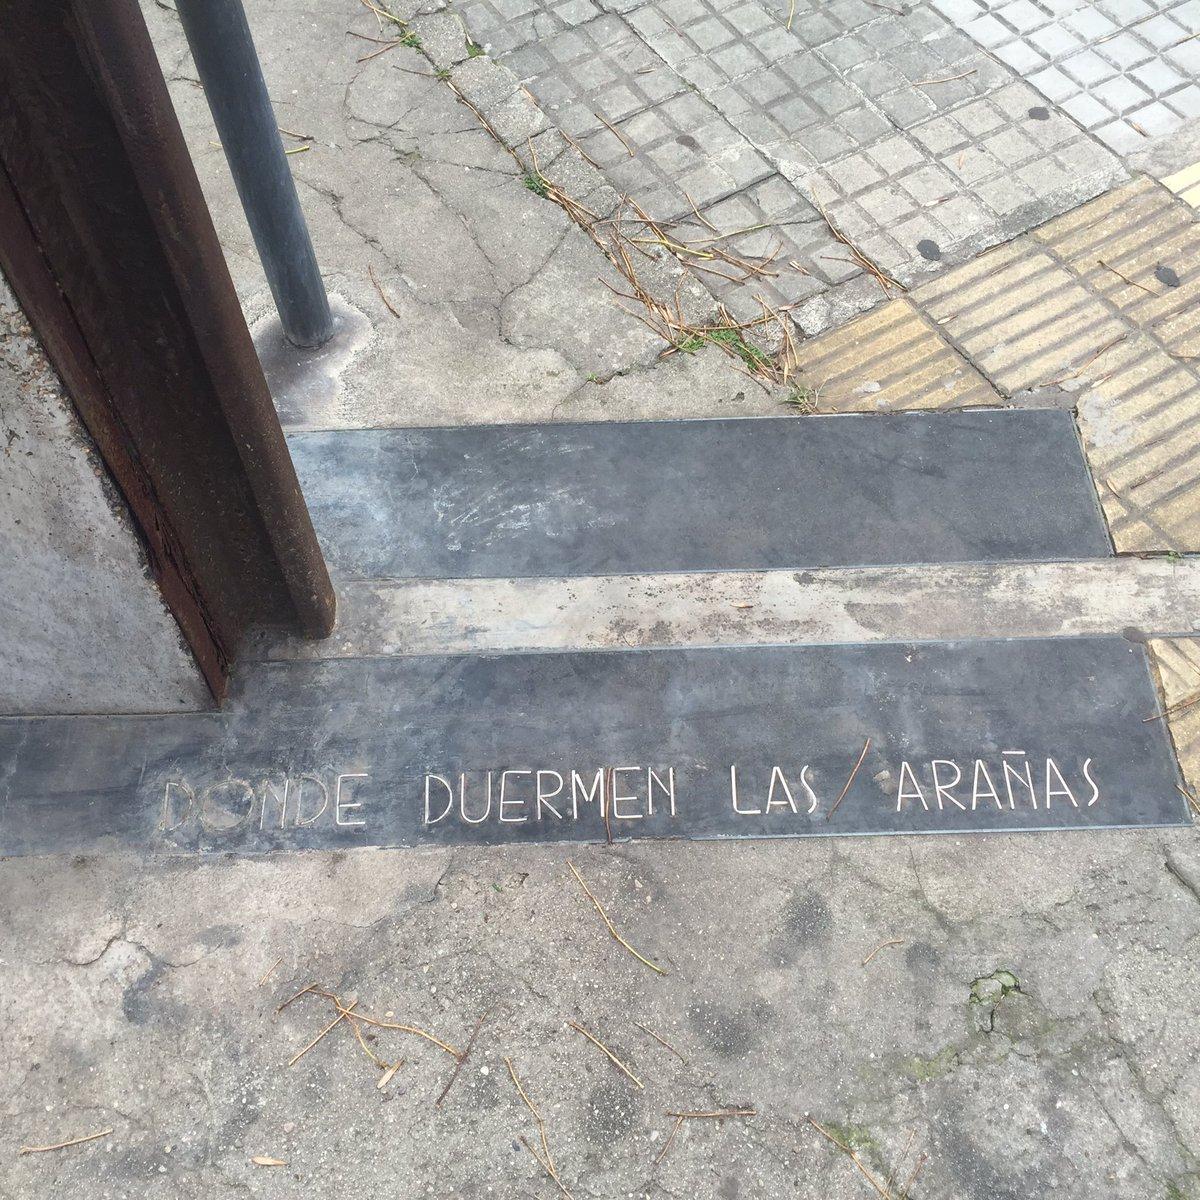 "Alvaro Hernandez Oliver on Twitter: ""Donde duermen las arañas, 13 ..."